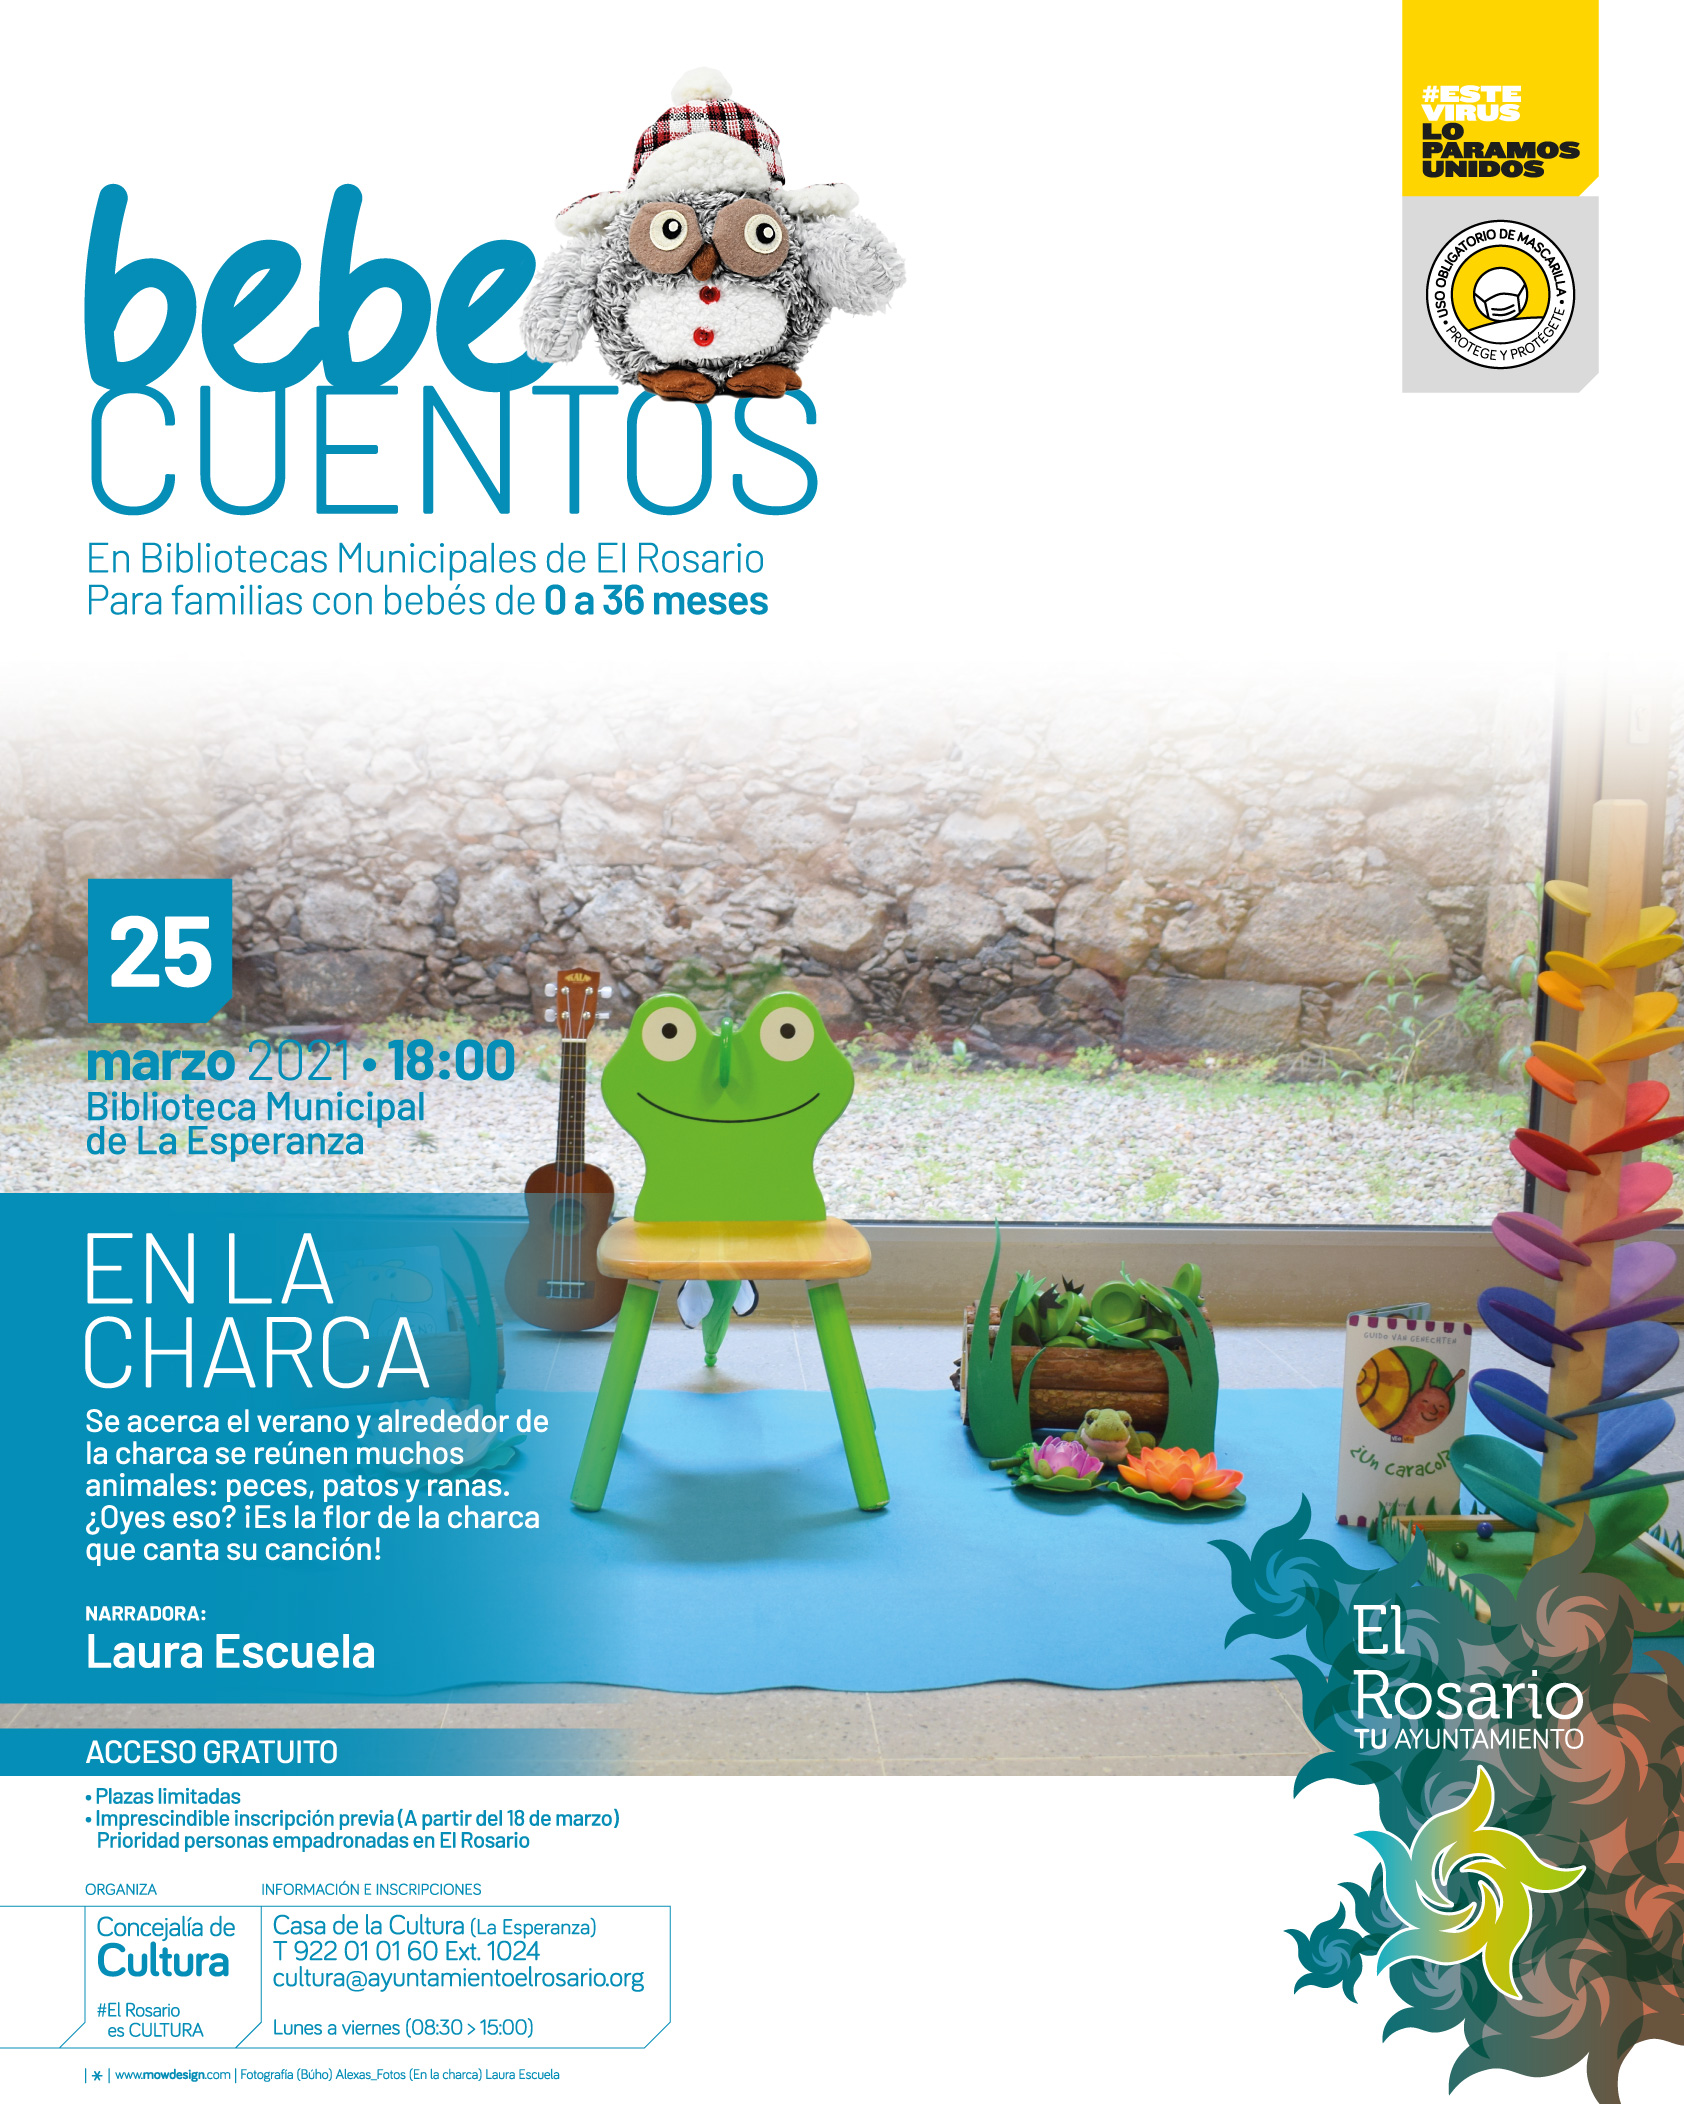 BEBECUENTOS-20210325-CARTEL_A3-20210311-01af-redes